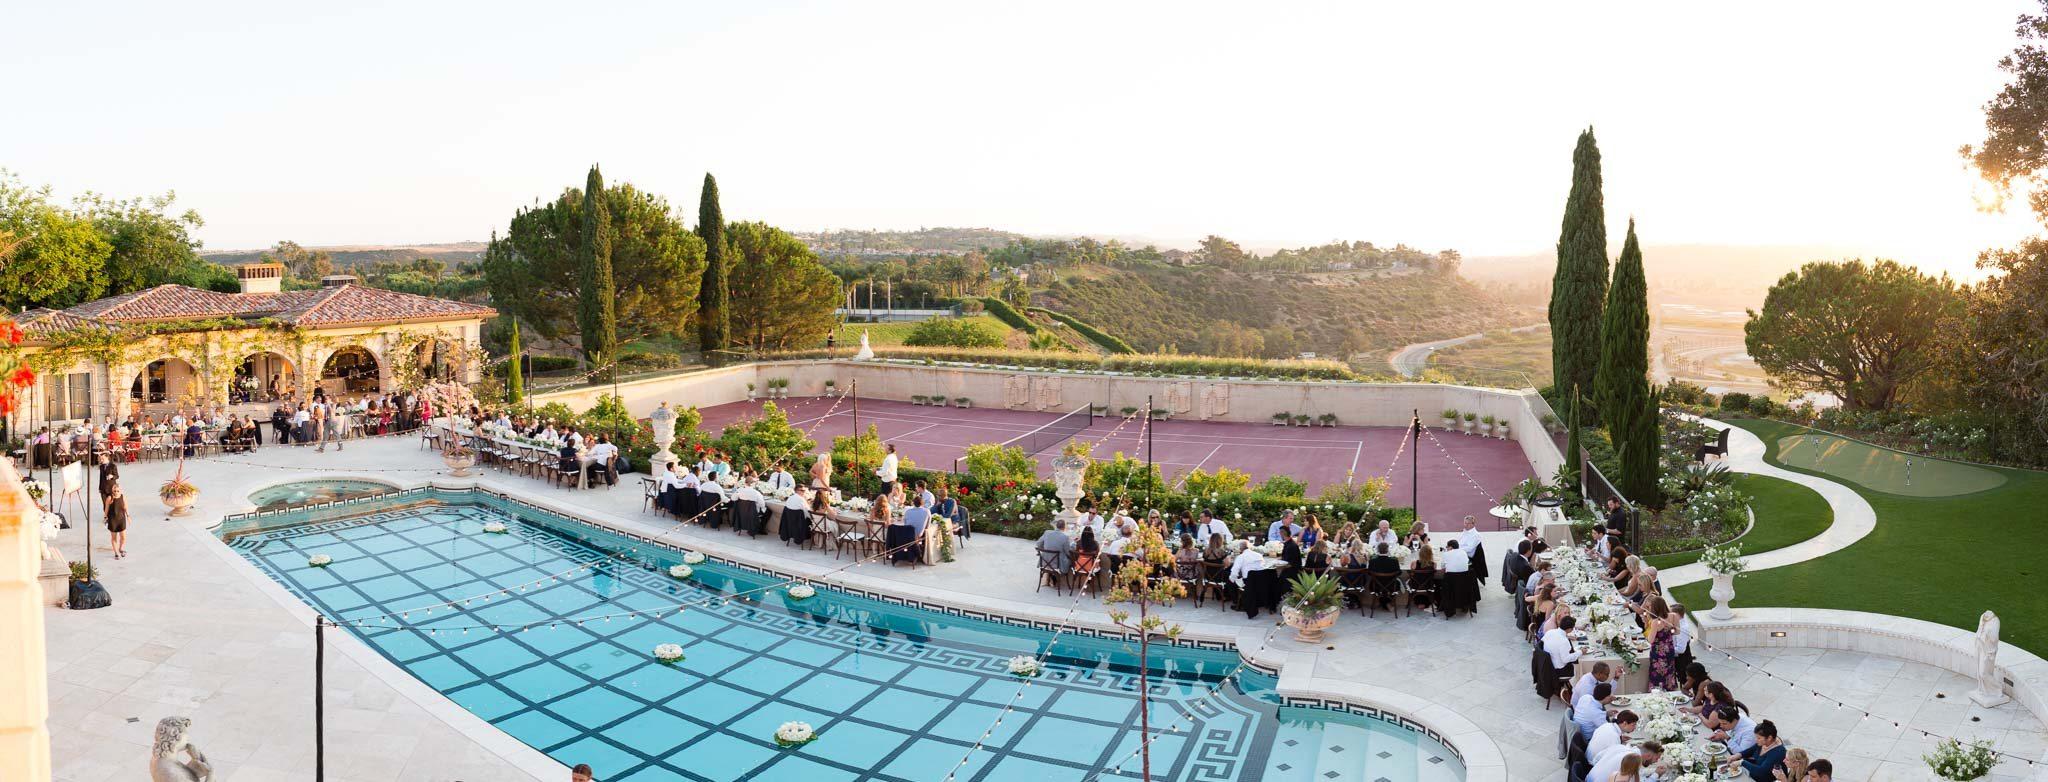 rancho_santa_fe_estate_wedding_128.jpg